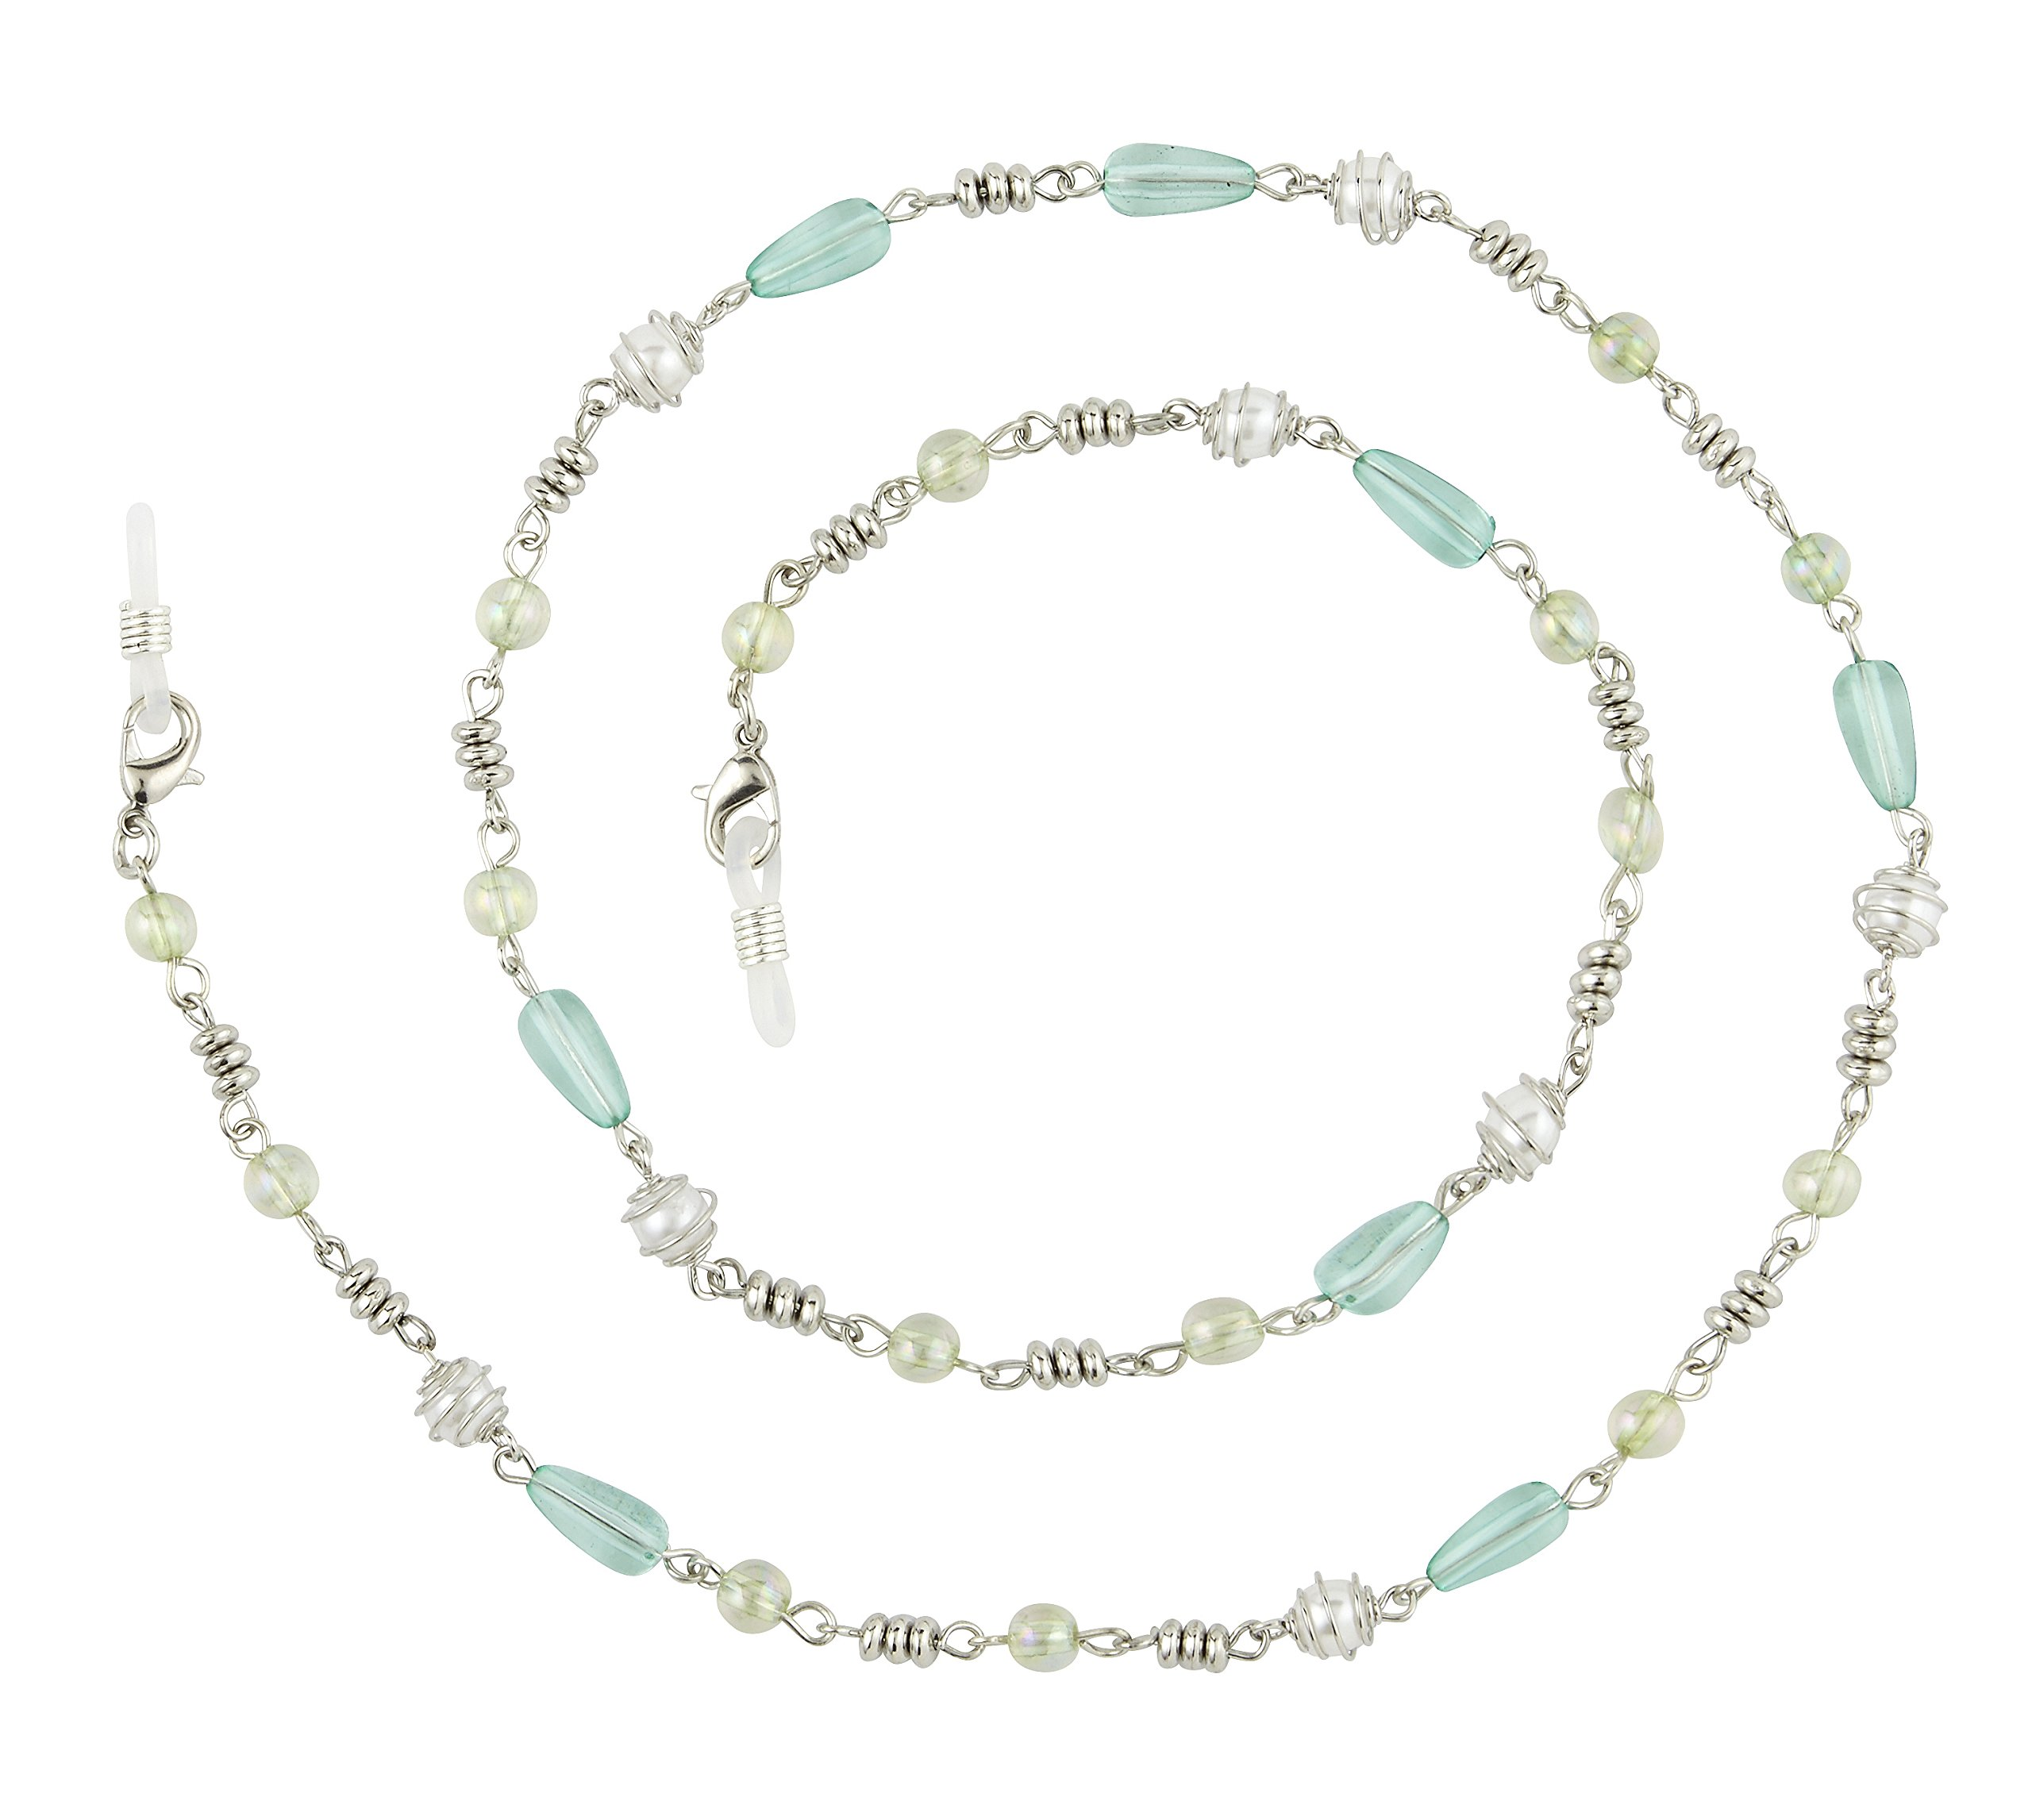 Beaded Eyeglass Chain Holder, Silver Or Gold Fashion Lanyard Necklace, Adella Aqua